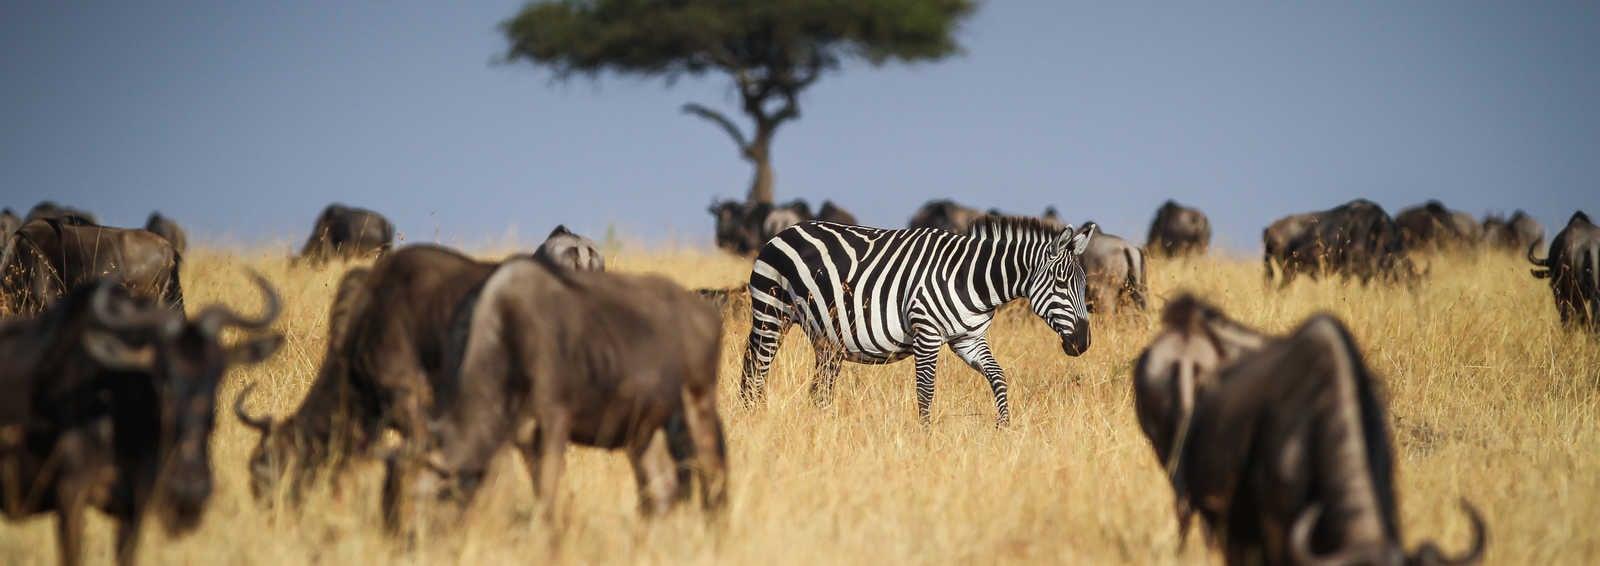 Lone Zebra, Masai Mara, Kenya